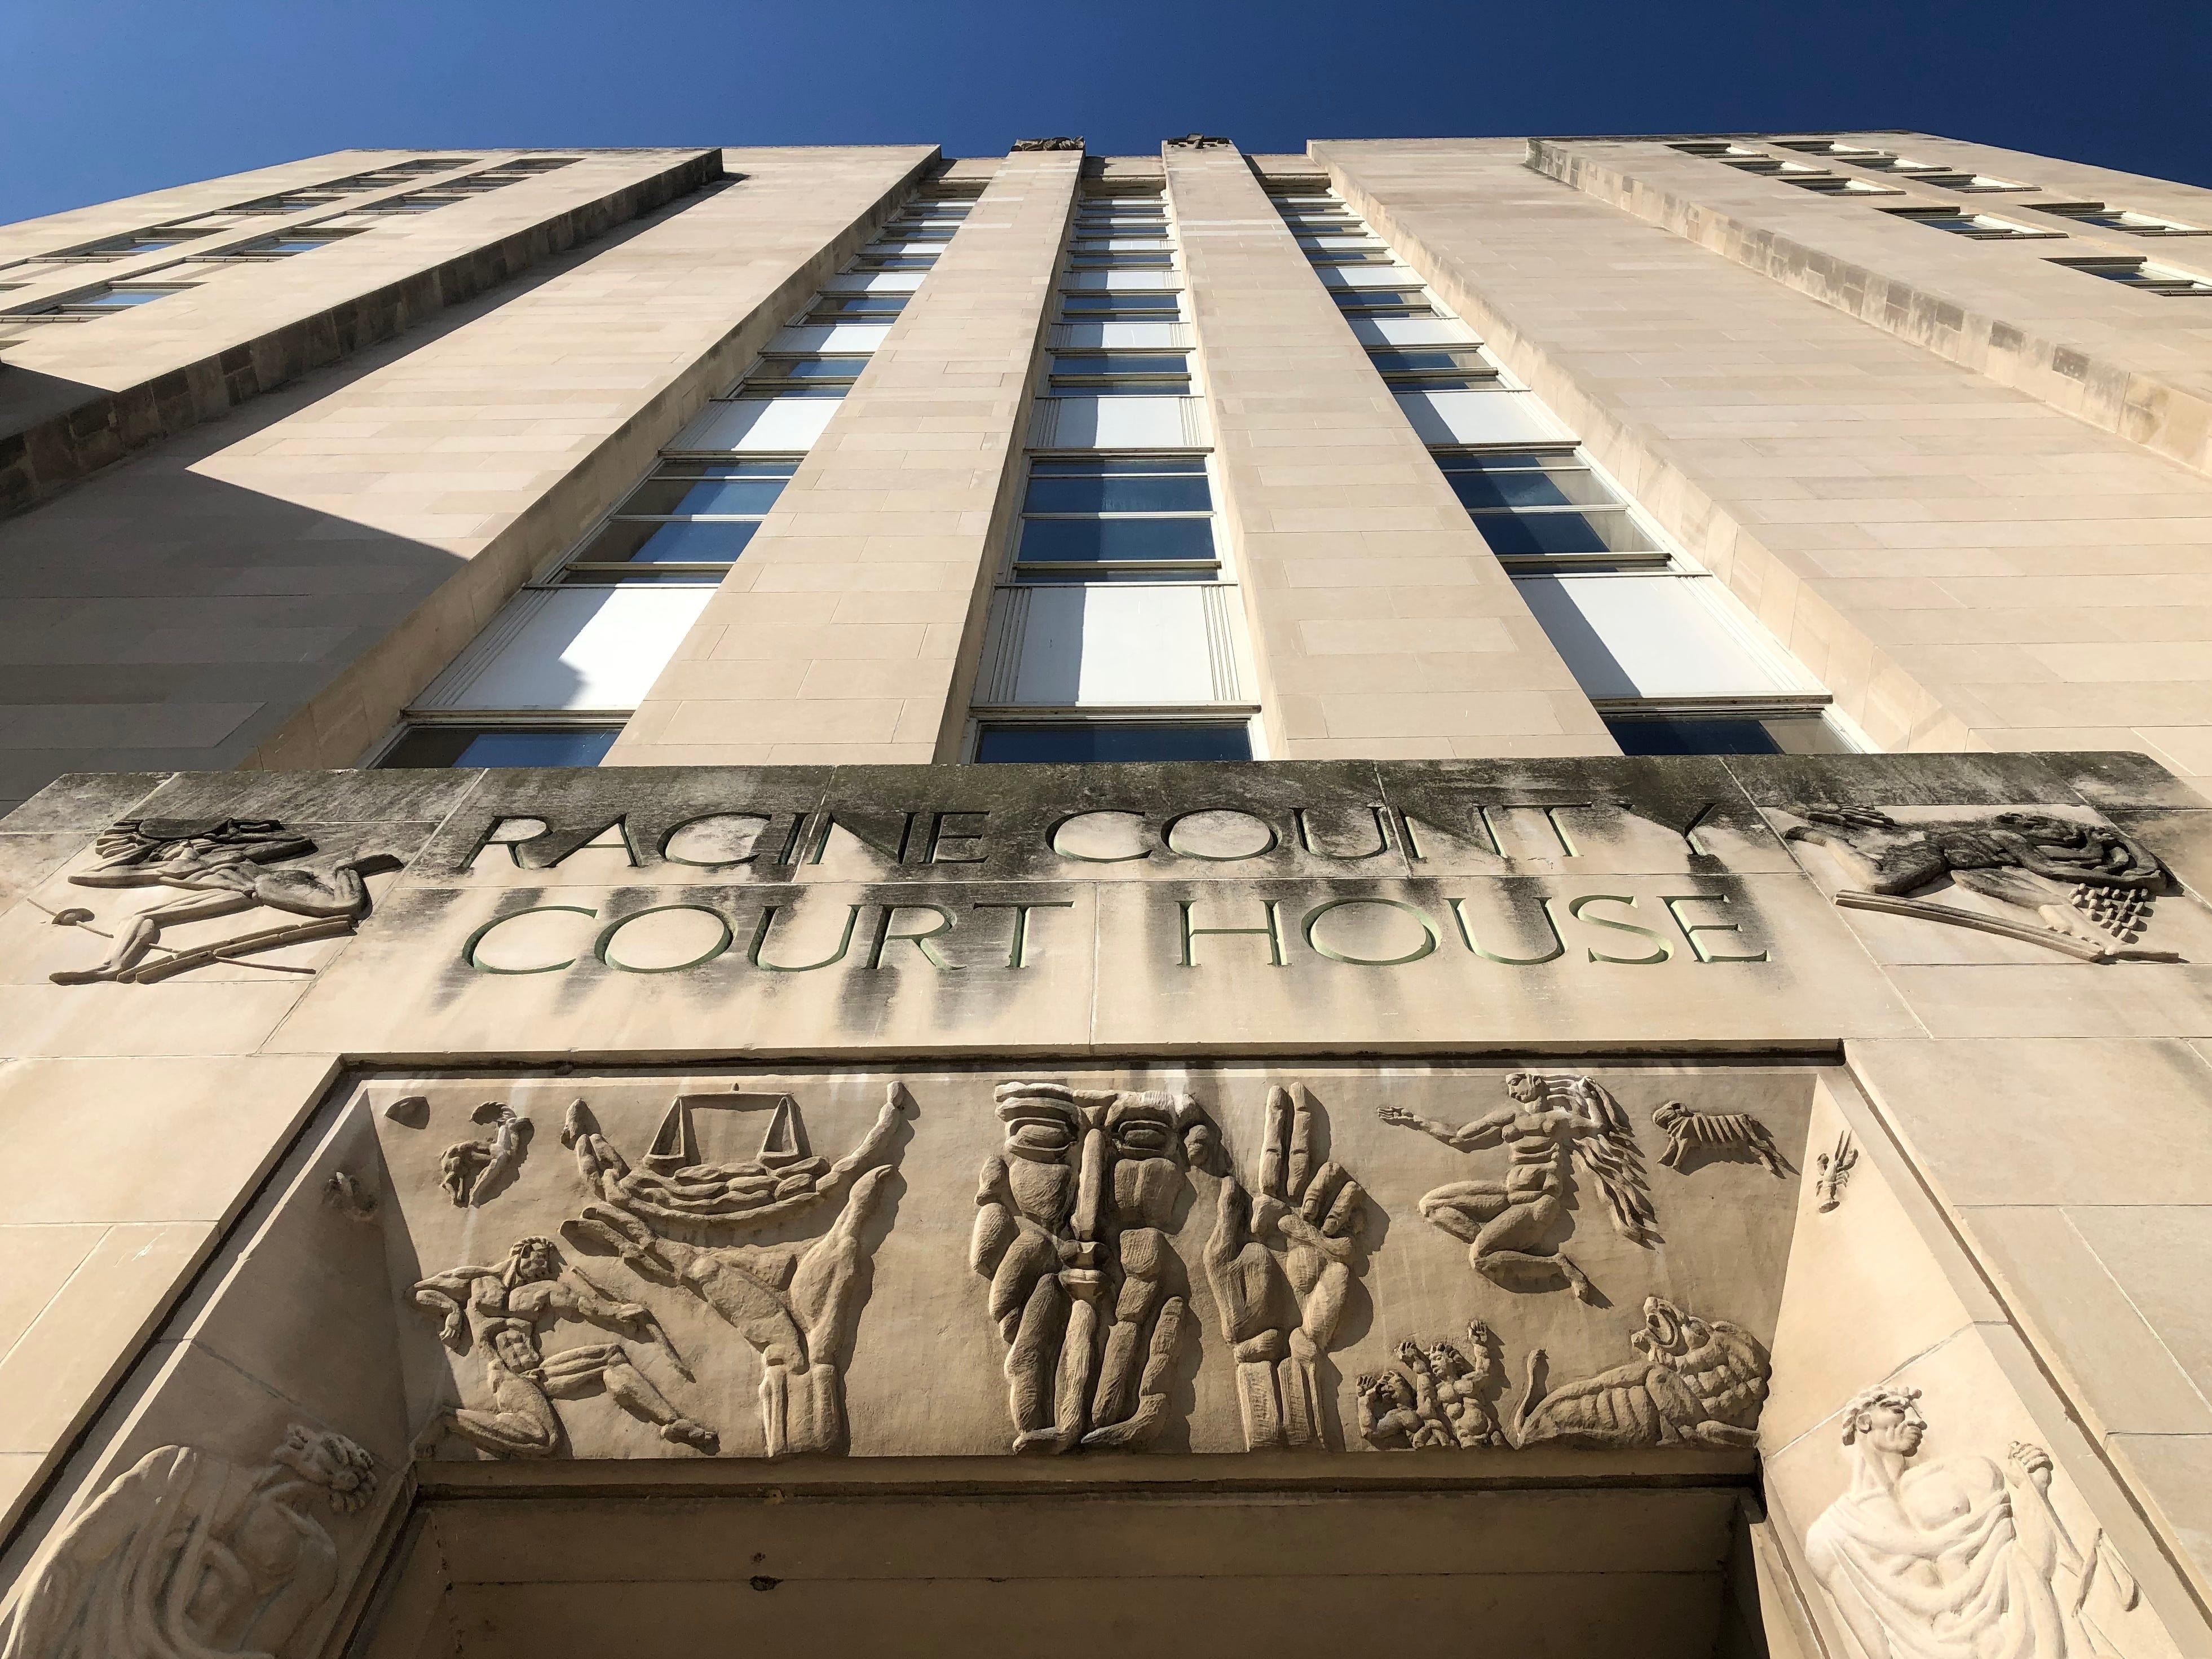 Racine County Court House.